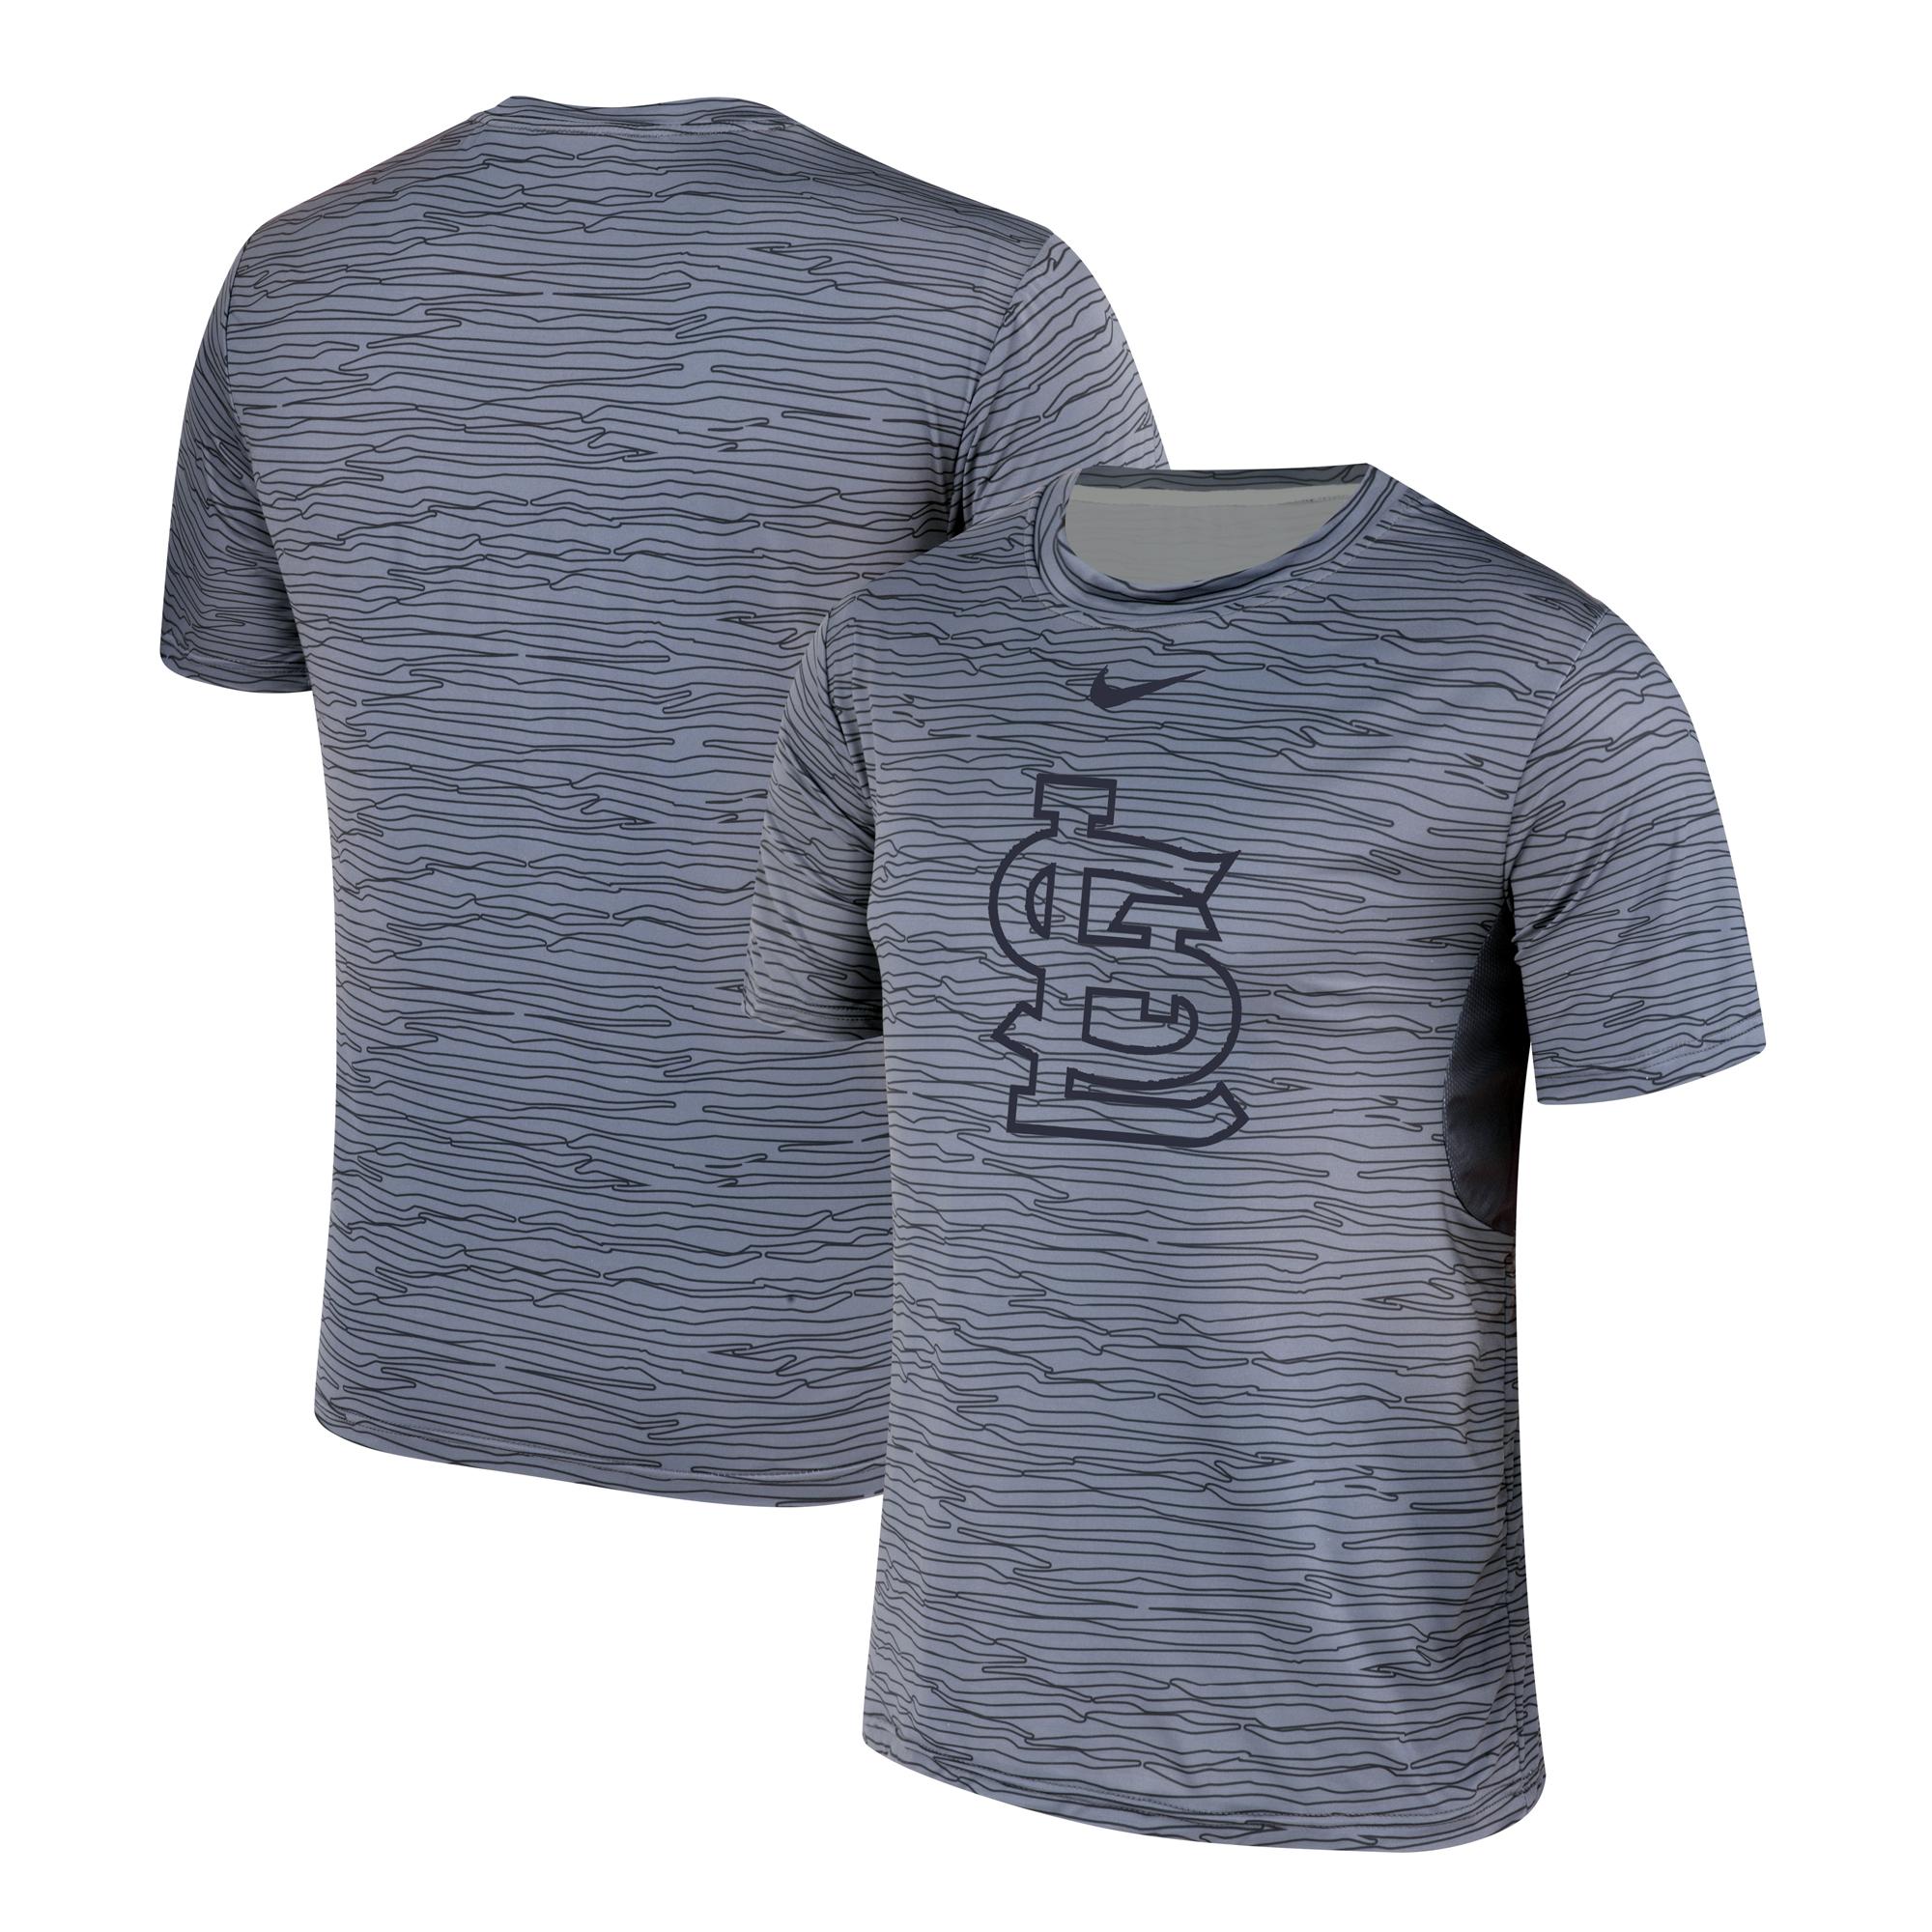 Nike St. Louis Cardinals Gray Black Striped Logo Performance T-Shirt